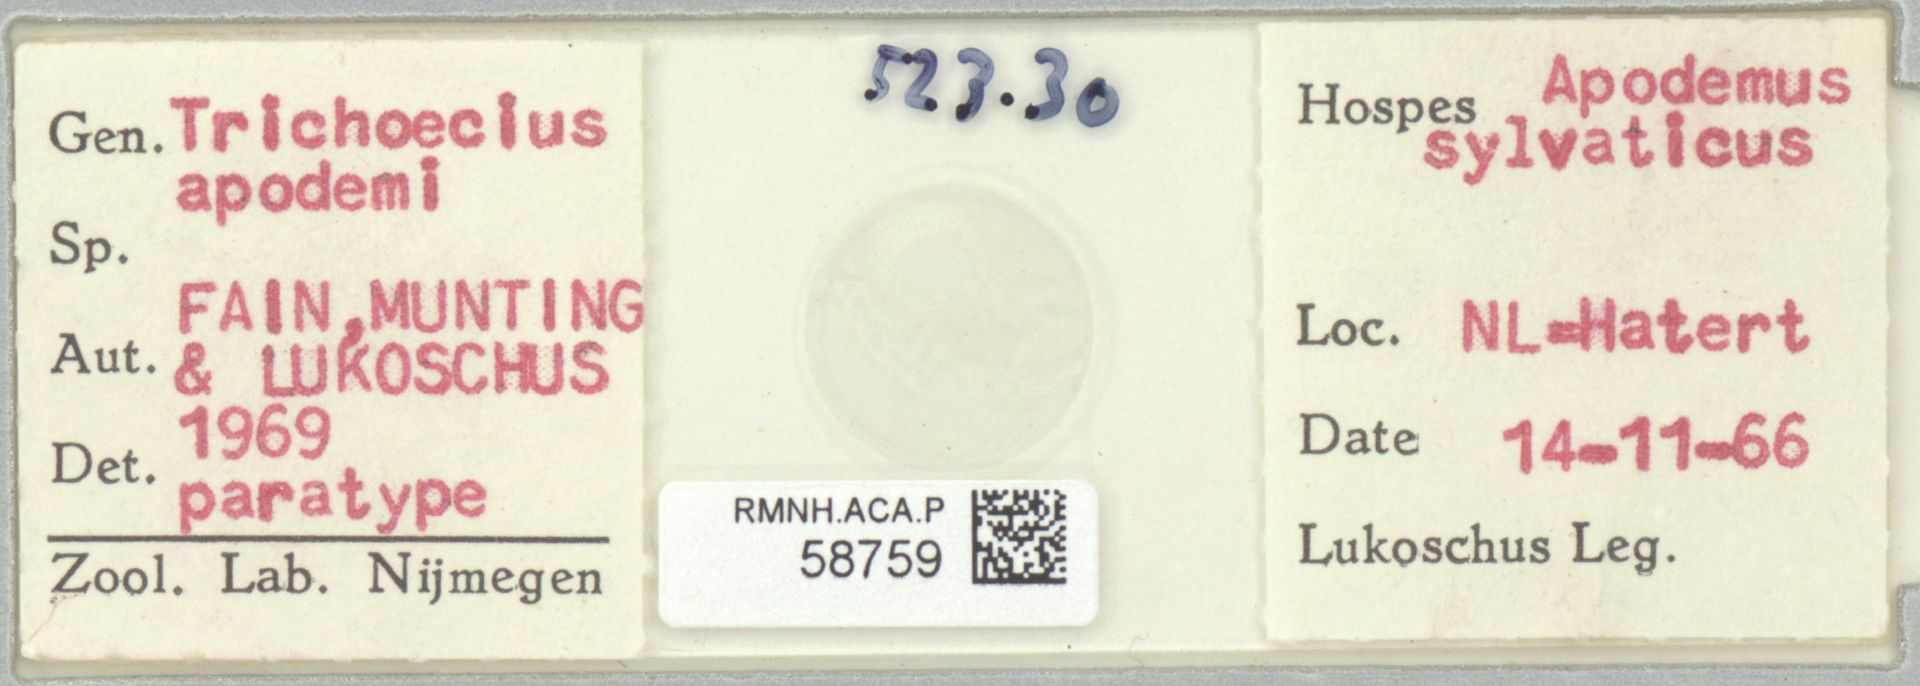 RMNH.ACA.P.58759   Trichoecius apodemi Fain, Munting, Lukoschus 1969